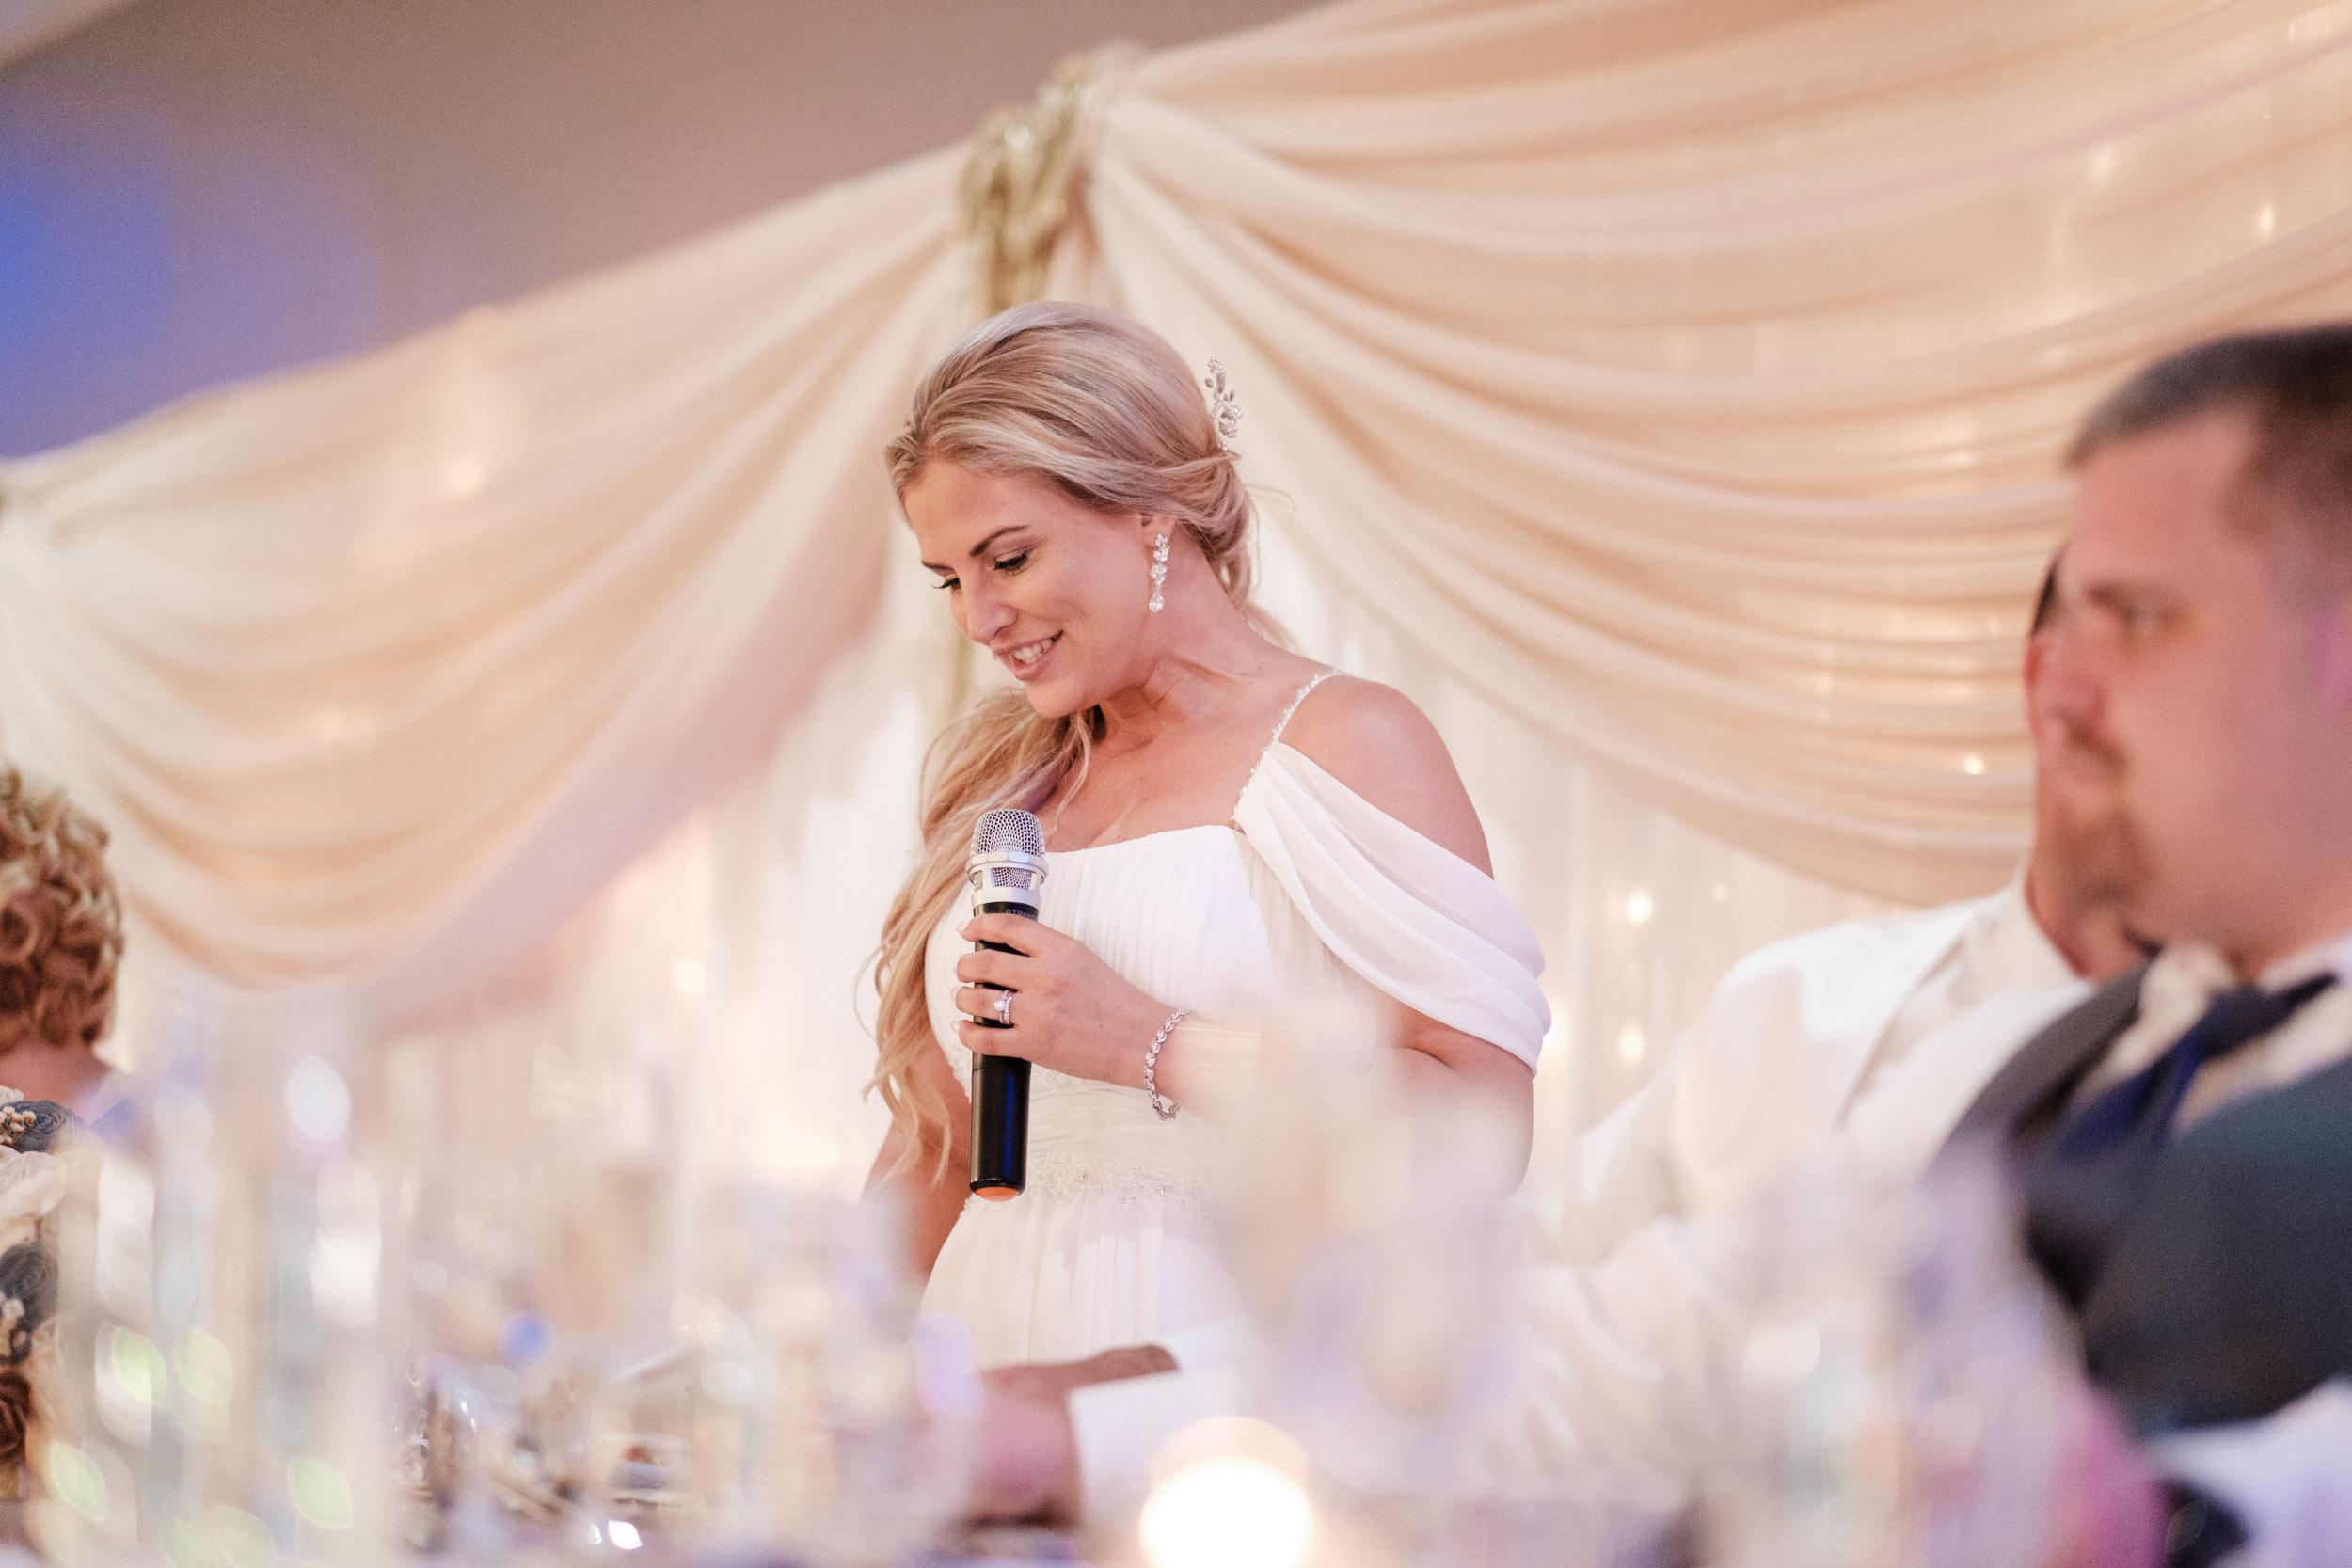 19-06-01 Megan Josh - Nicholas Conservatory Wedding-61.jpg